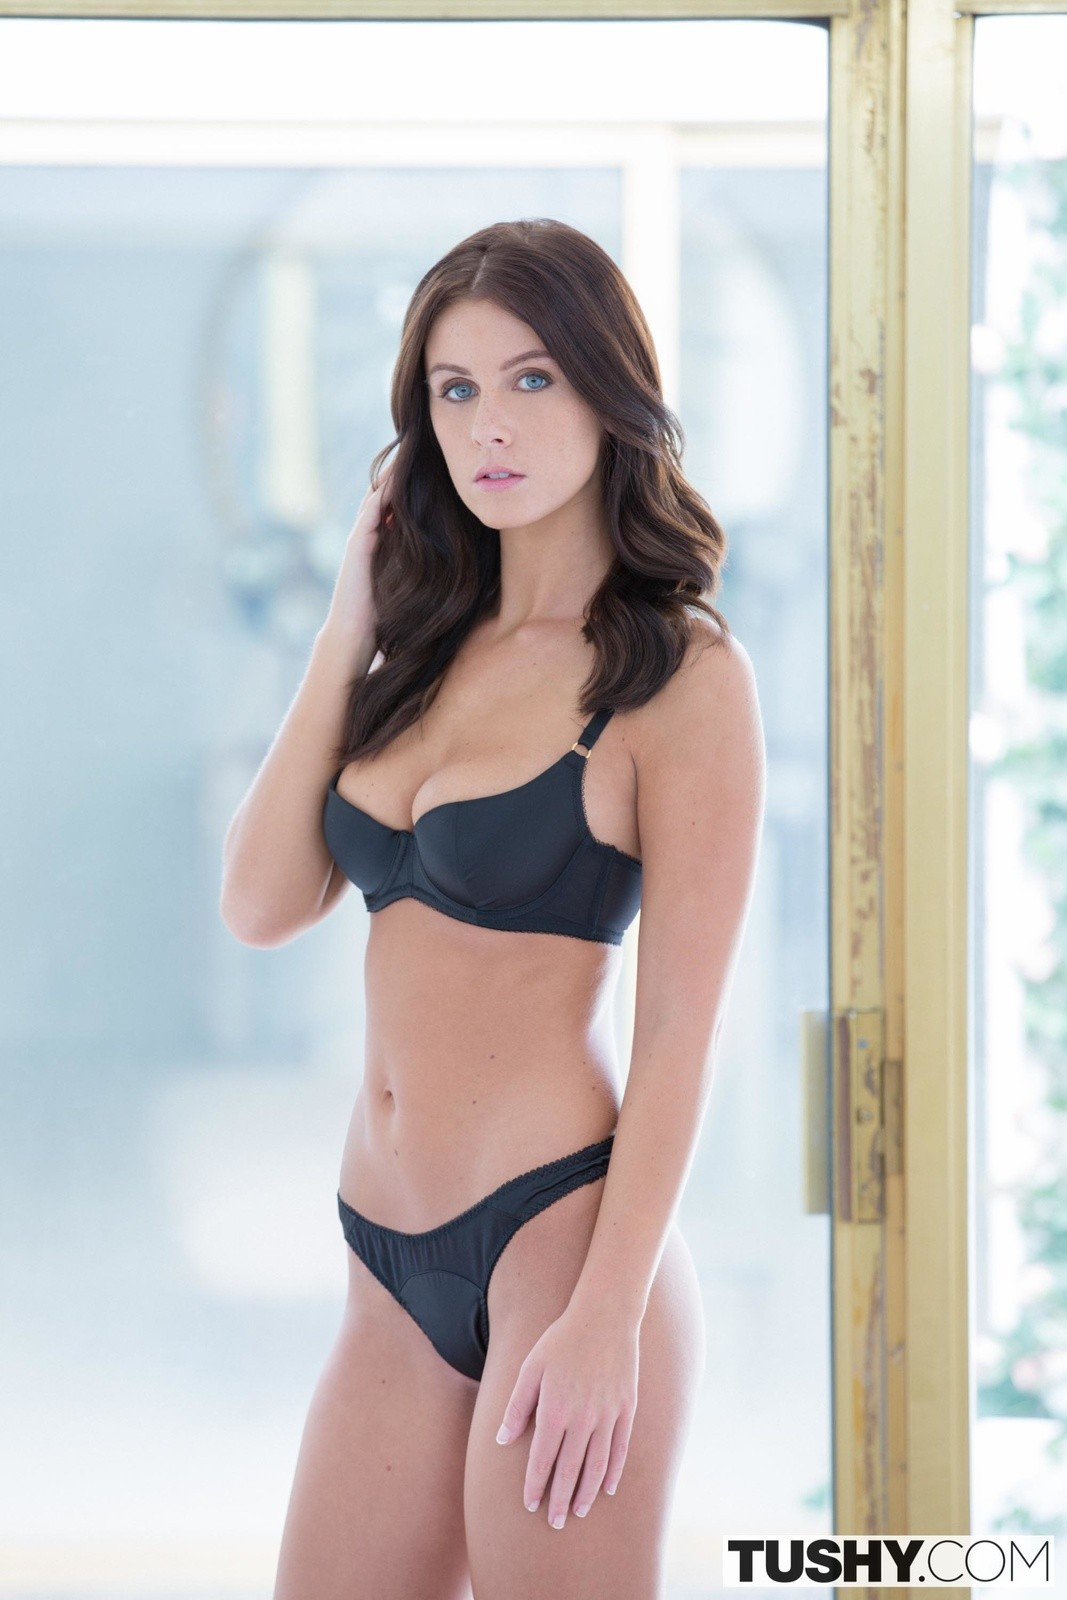 People 1067x1600 brunette lingerie women Whitney Westgate pornstar bra Tushy